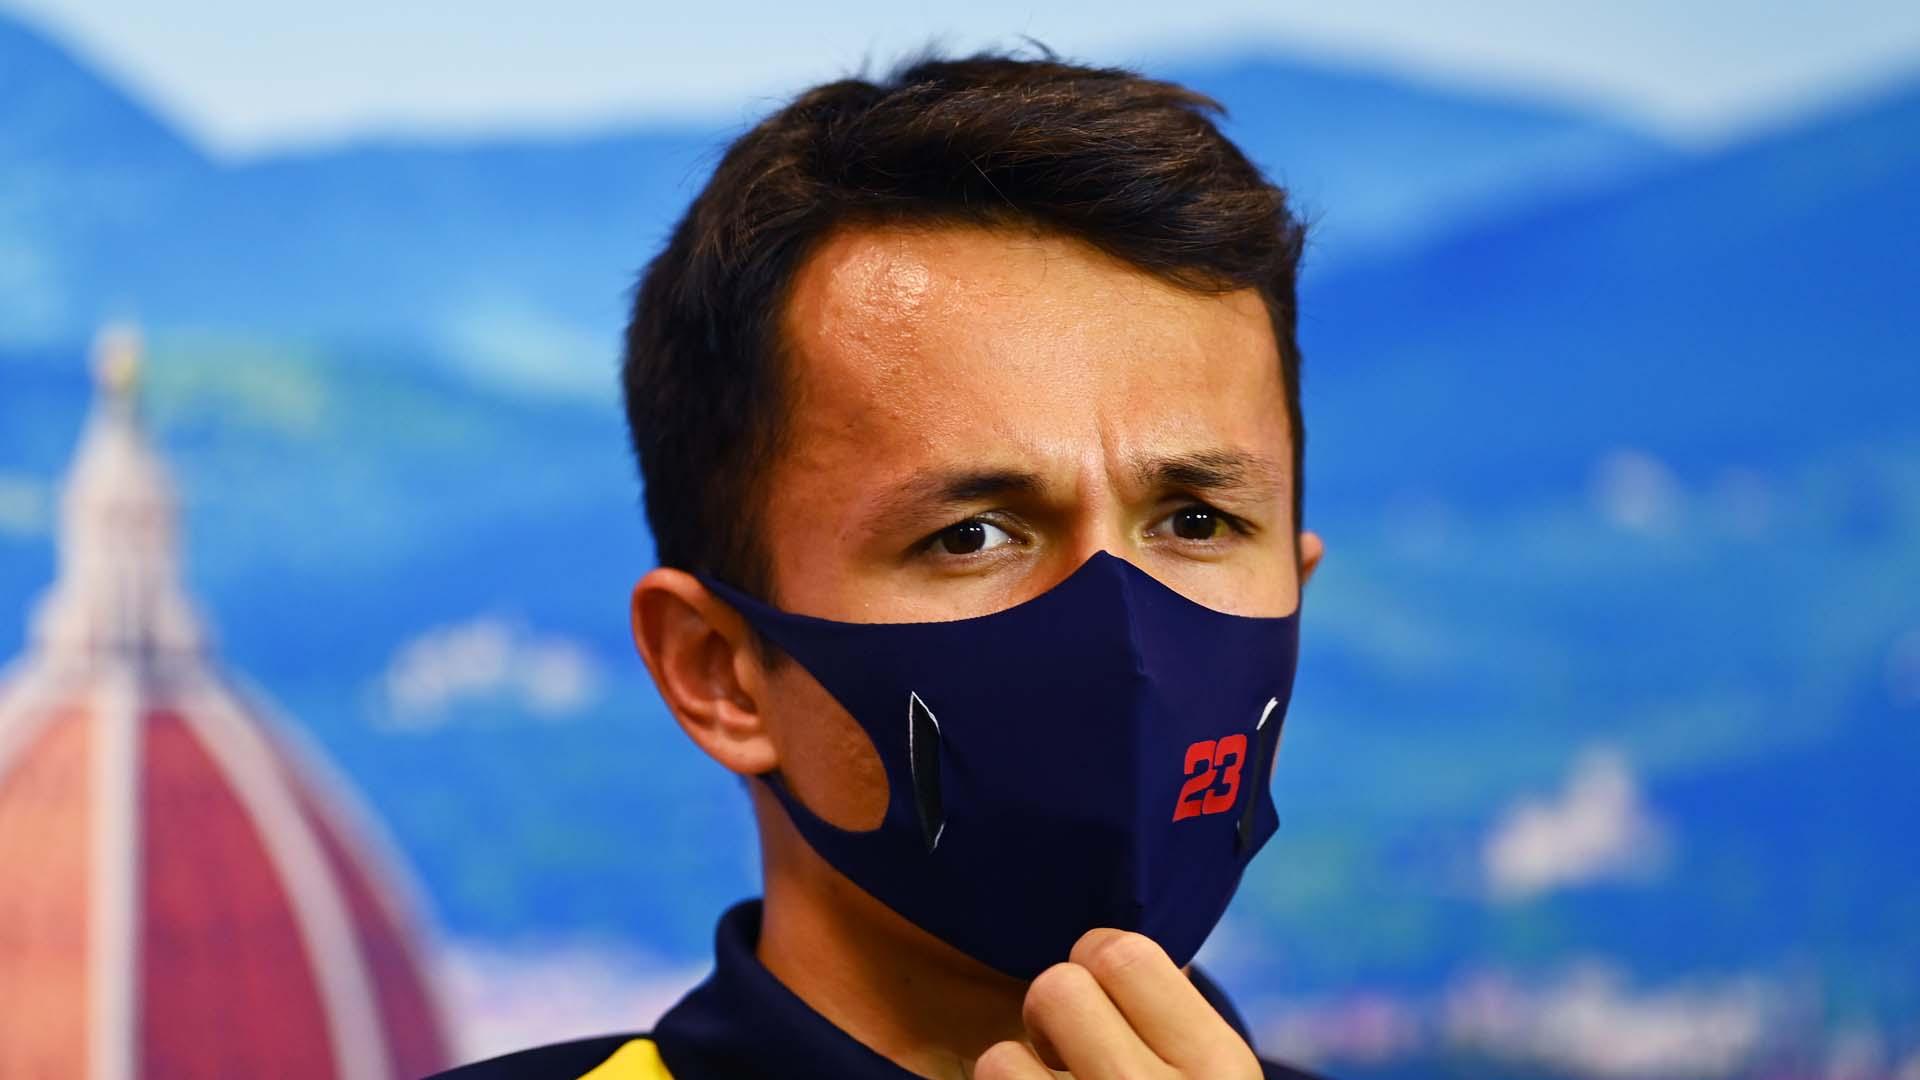 F1 Grand Prix of Tuscany - Previews